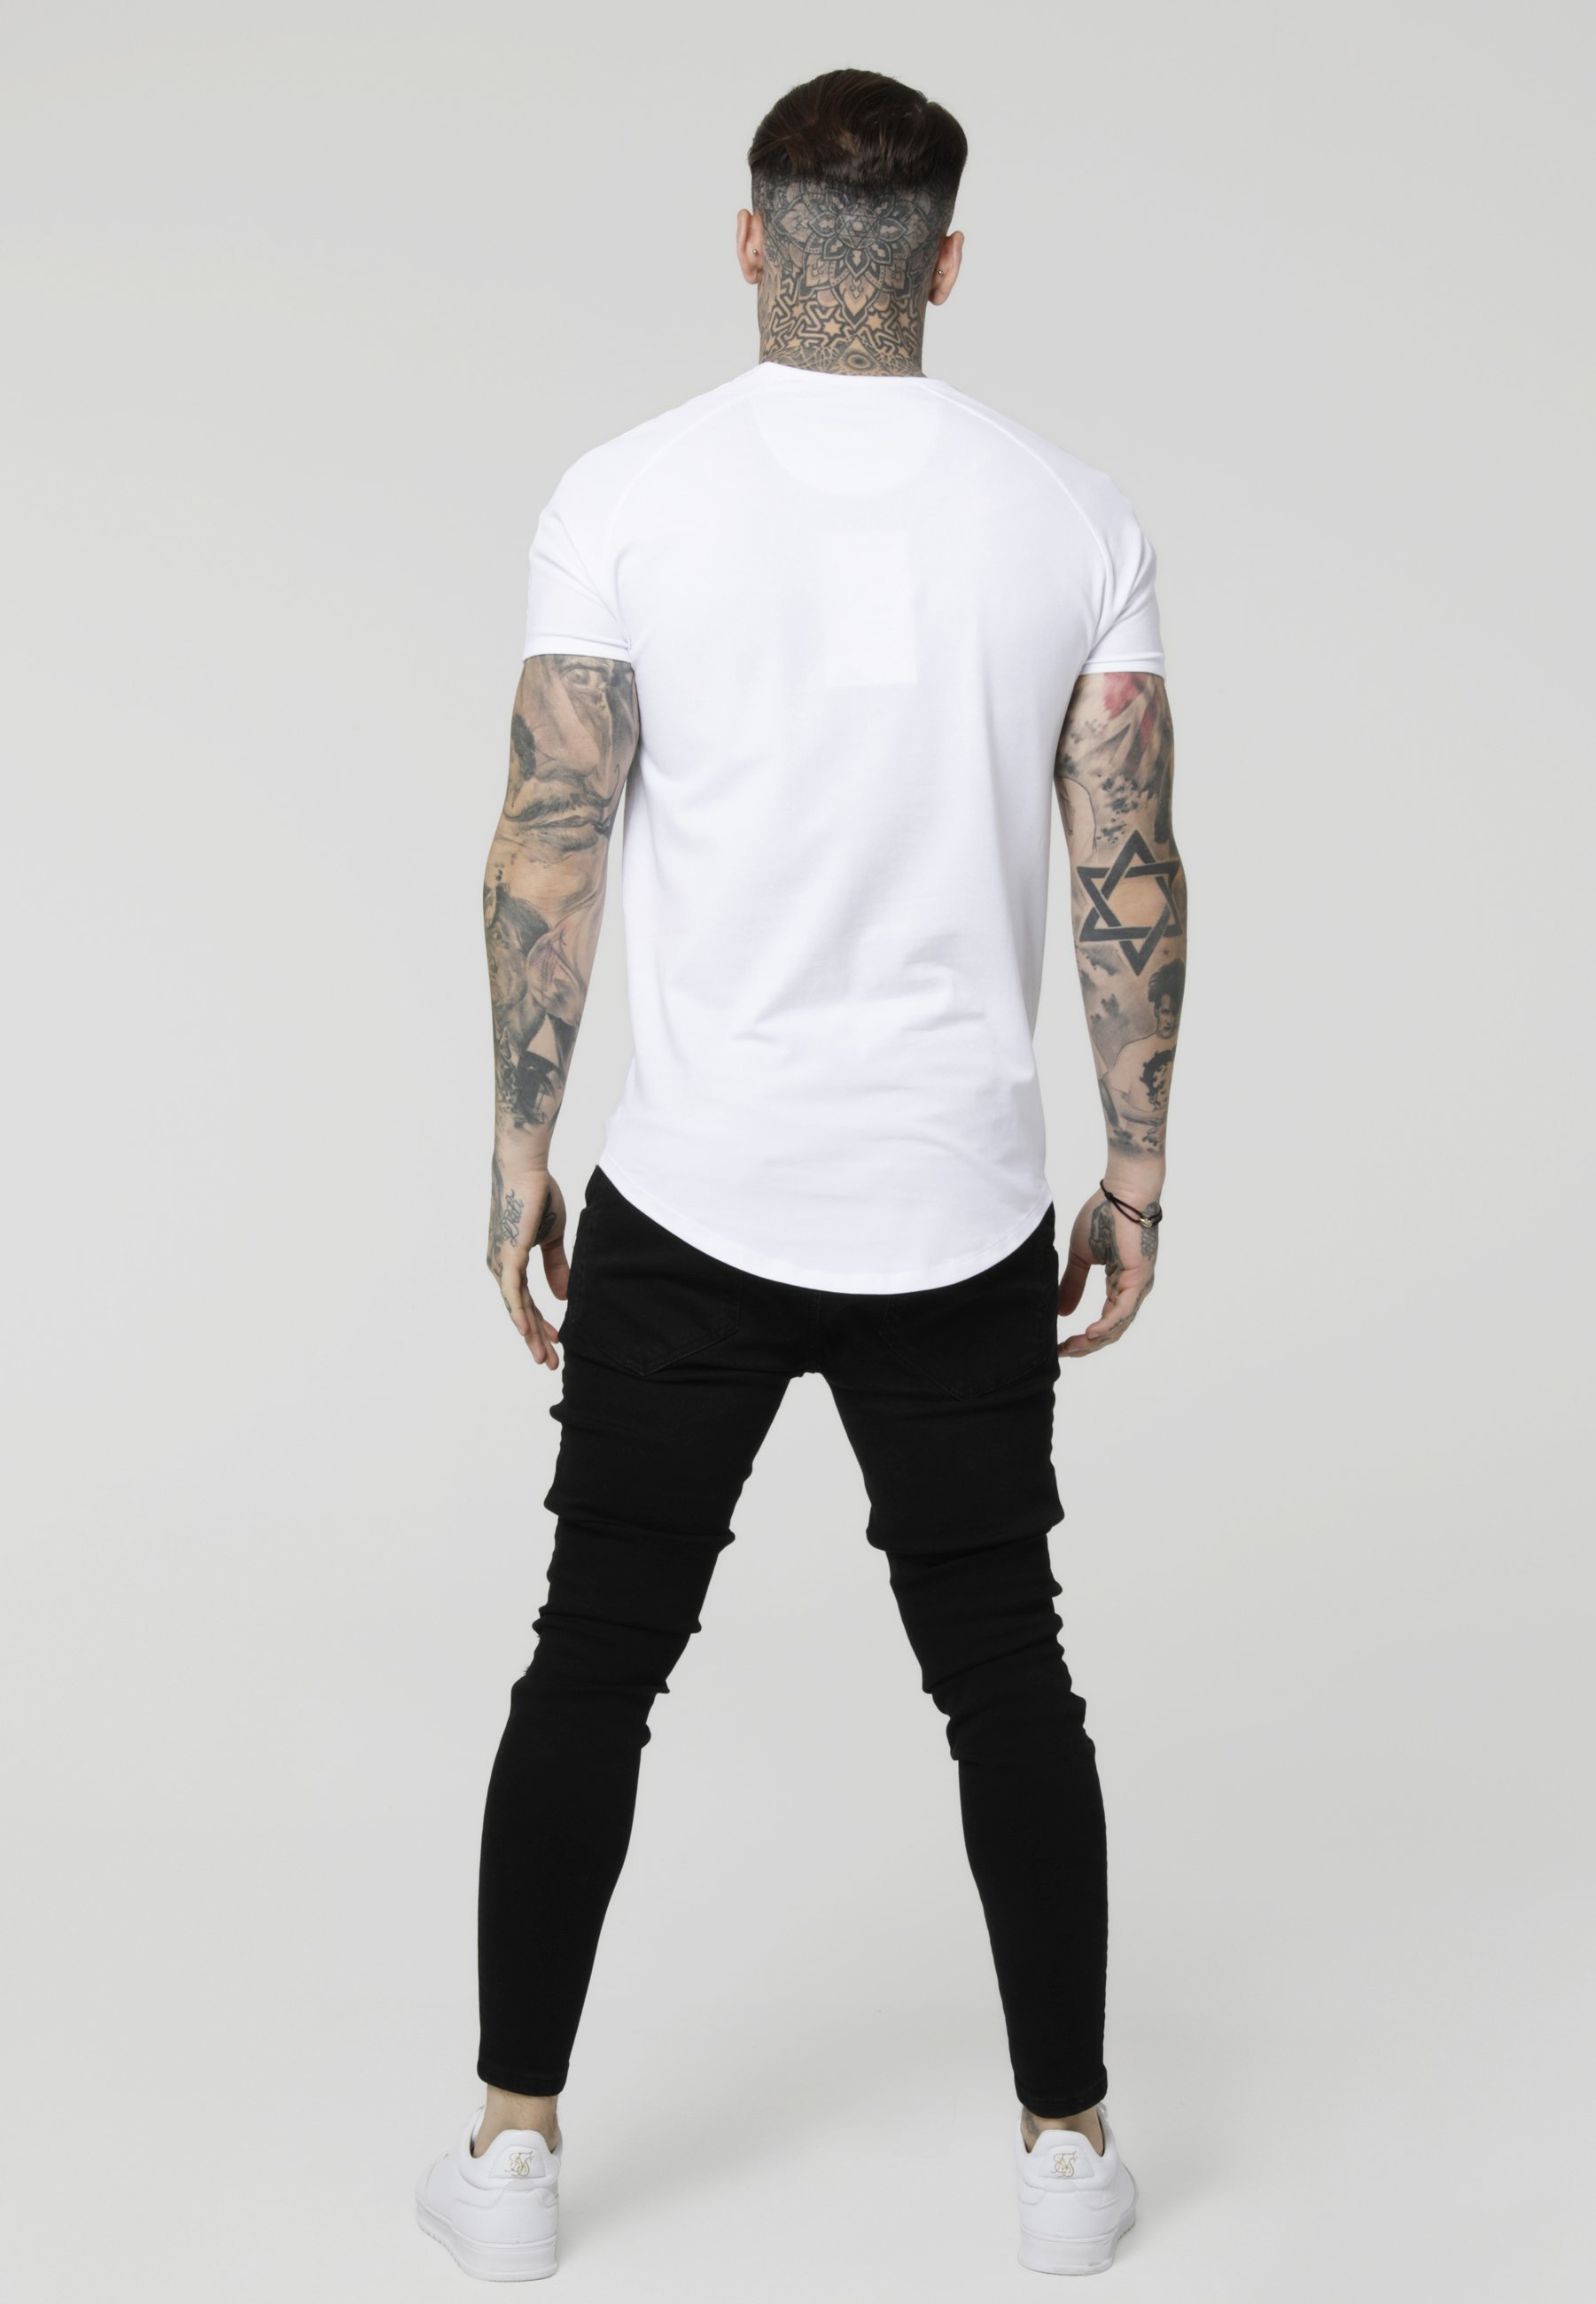 TeeT White Gym Imprimé shirt Siksilk silver Tape WE2D9YHI